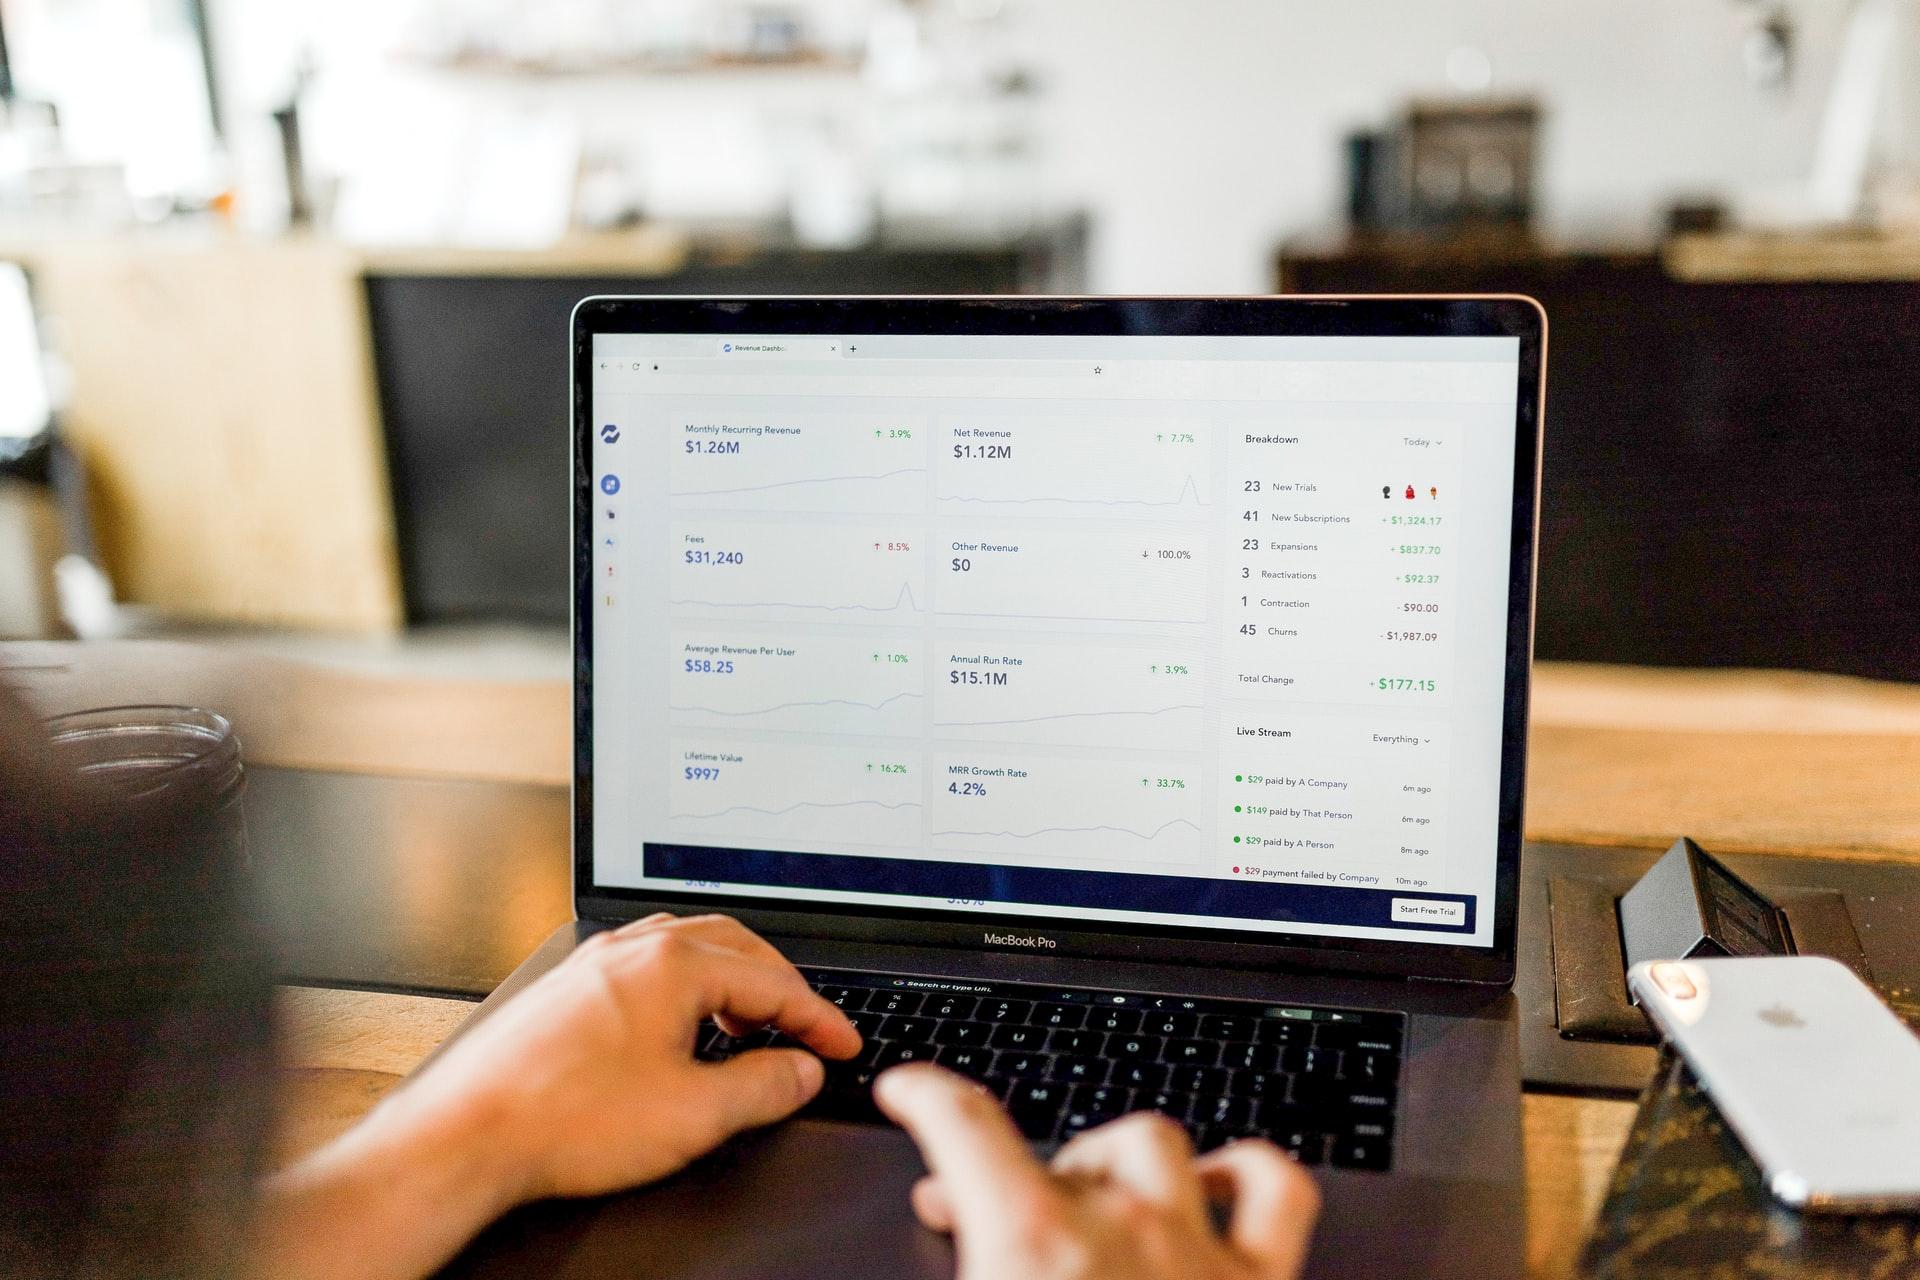 Message from Payaca CEO Matt Franklin - The Way Forward